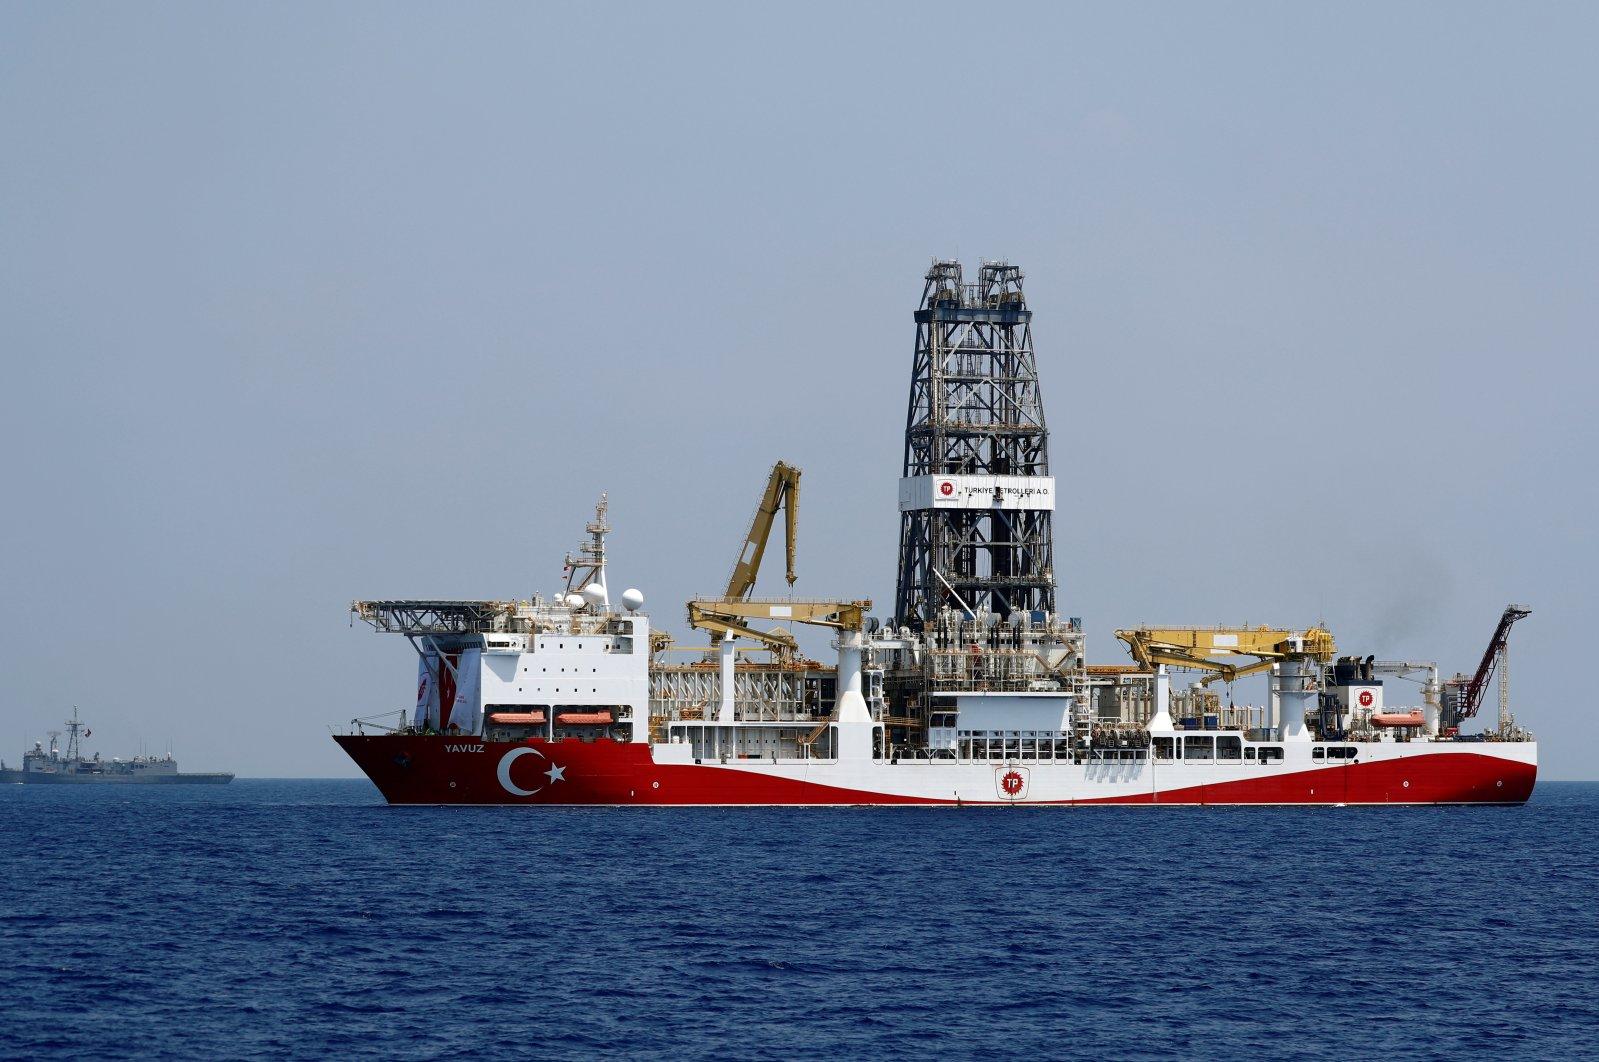 Turkish drilling vessel Yavuz is escorted by Turkish Navy frigate TCG Gemlik (F-492) in the eastern Mediterranean Sea, August 6, 2019. Picture taken August 6, 2019. (Reuters Photo)